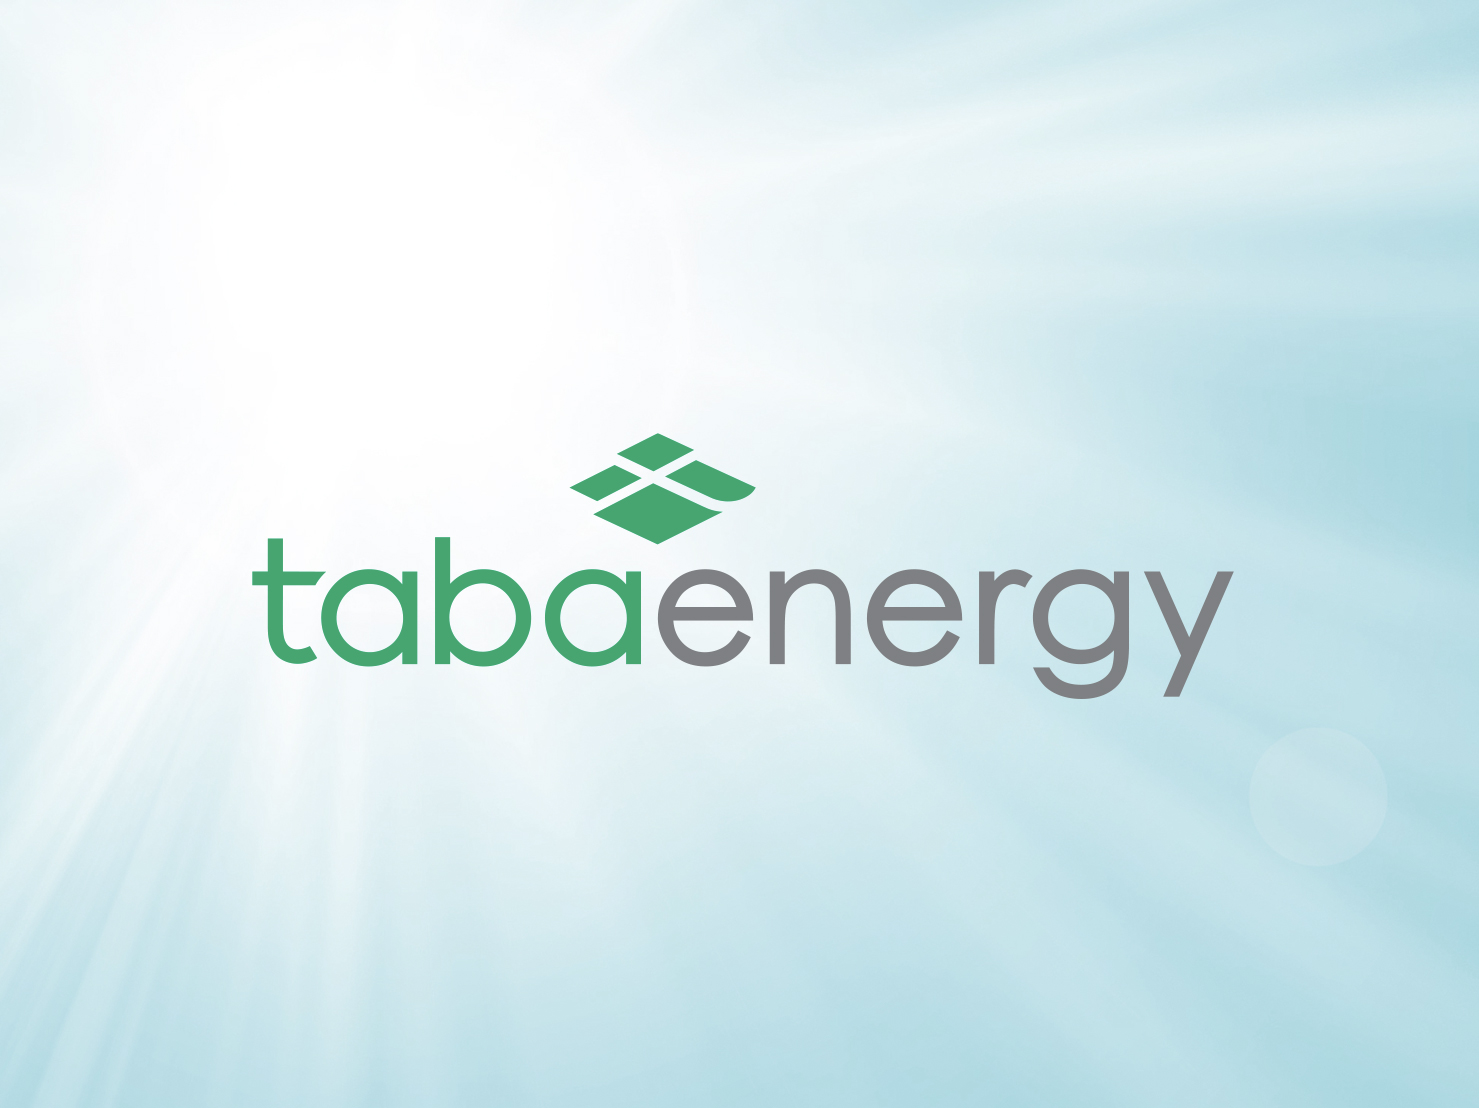 Logo-Design-Images_2019_Horizontals_taba.jpg